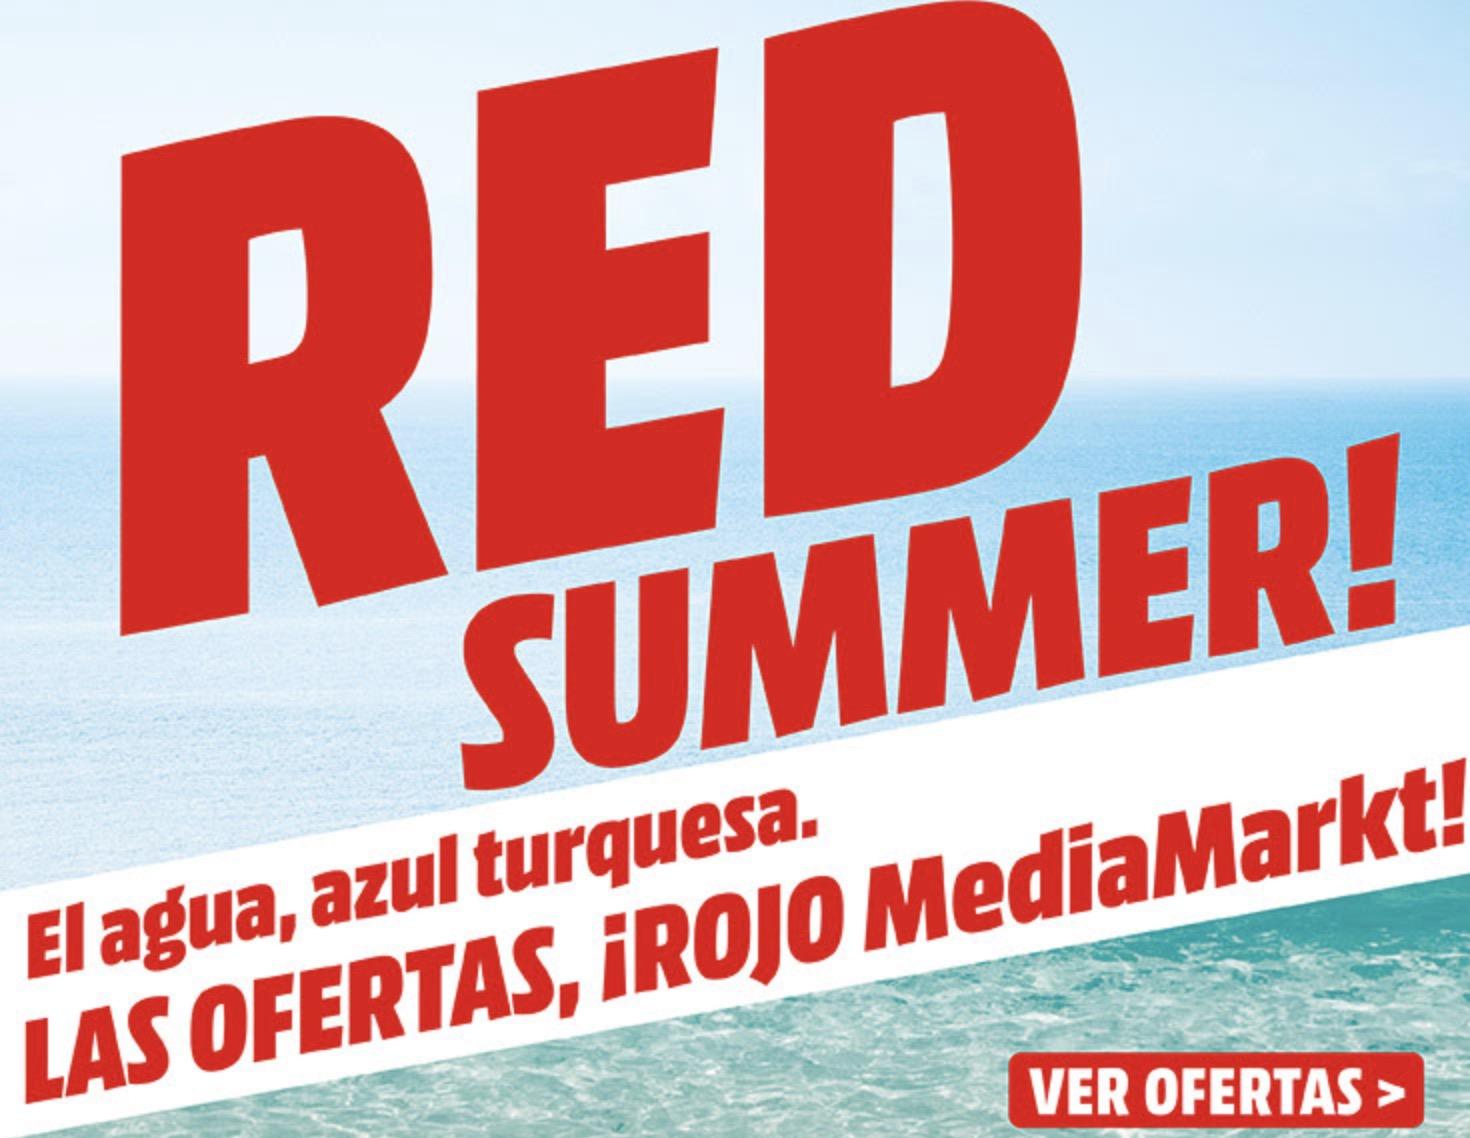 RED SUMMER Mediamarkt